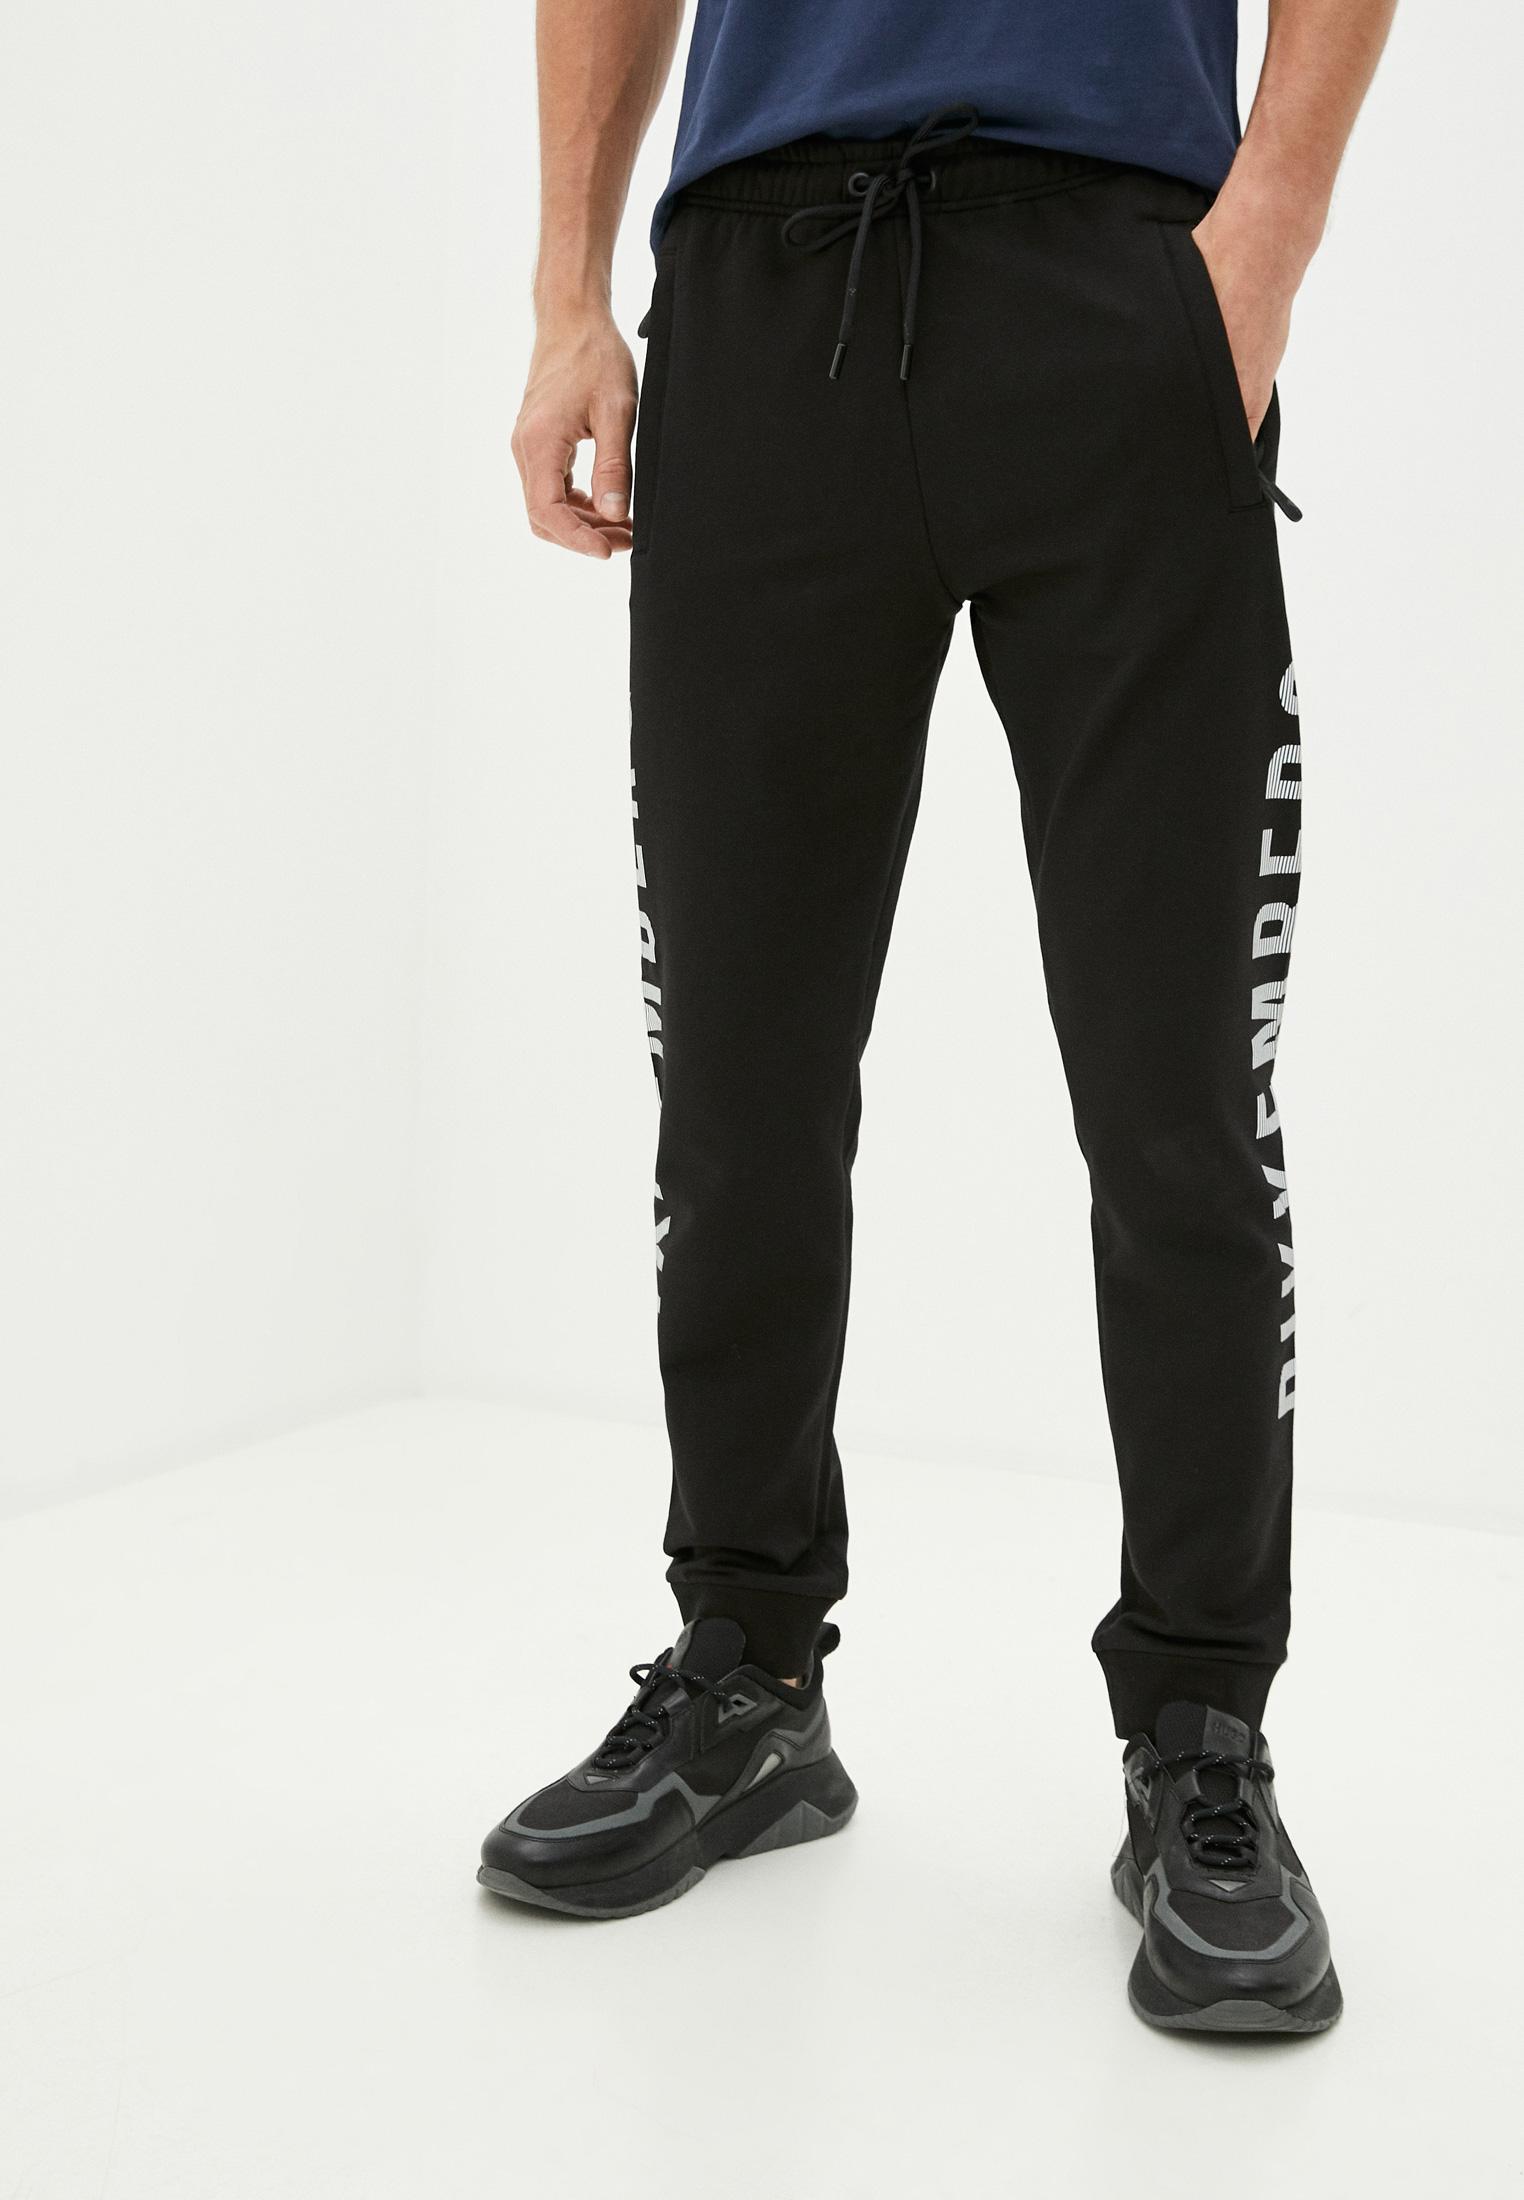 Мужские спортивные брюки Bikkembergs (Биккембергс) C 1 166 1X E 2191